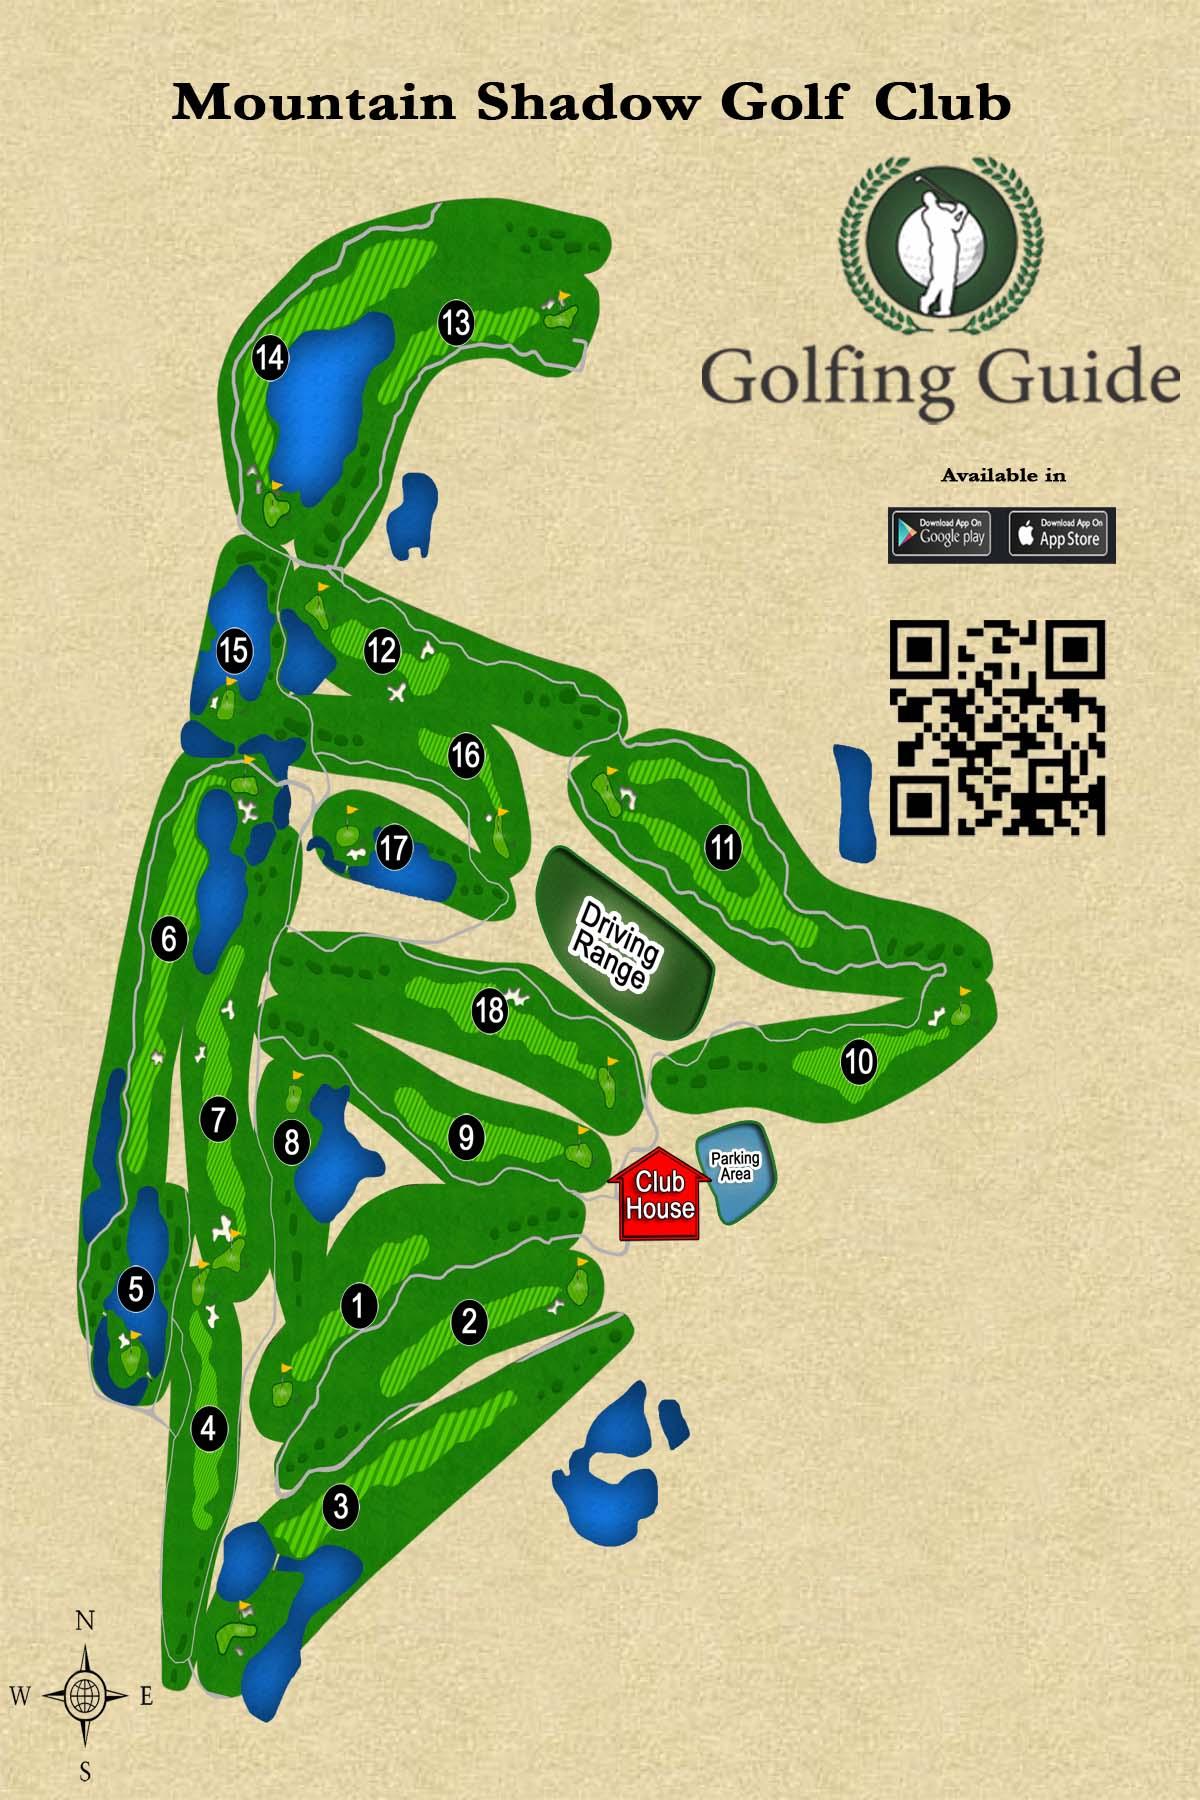 Golf Course Clubhouse Interior Design Ideas: Mountain Shadow Golf Club︱Golf Course In Pattaya, Thailand